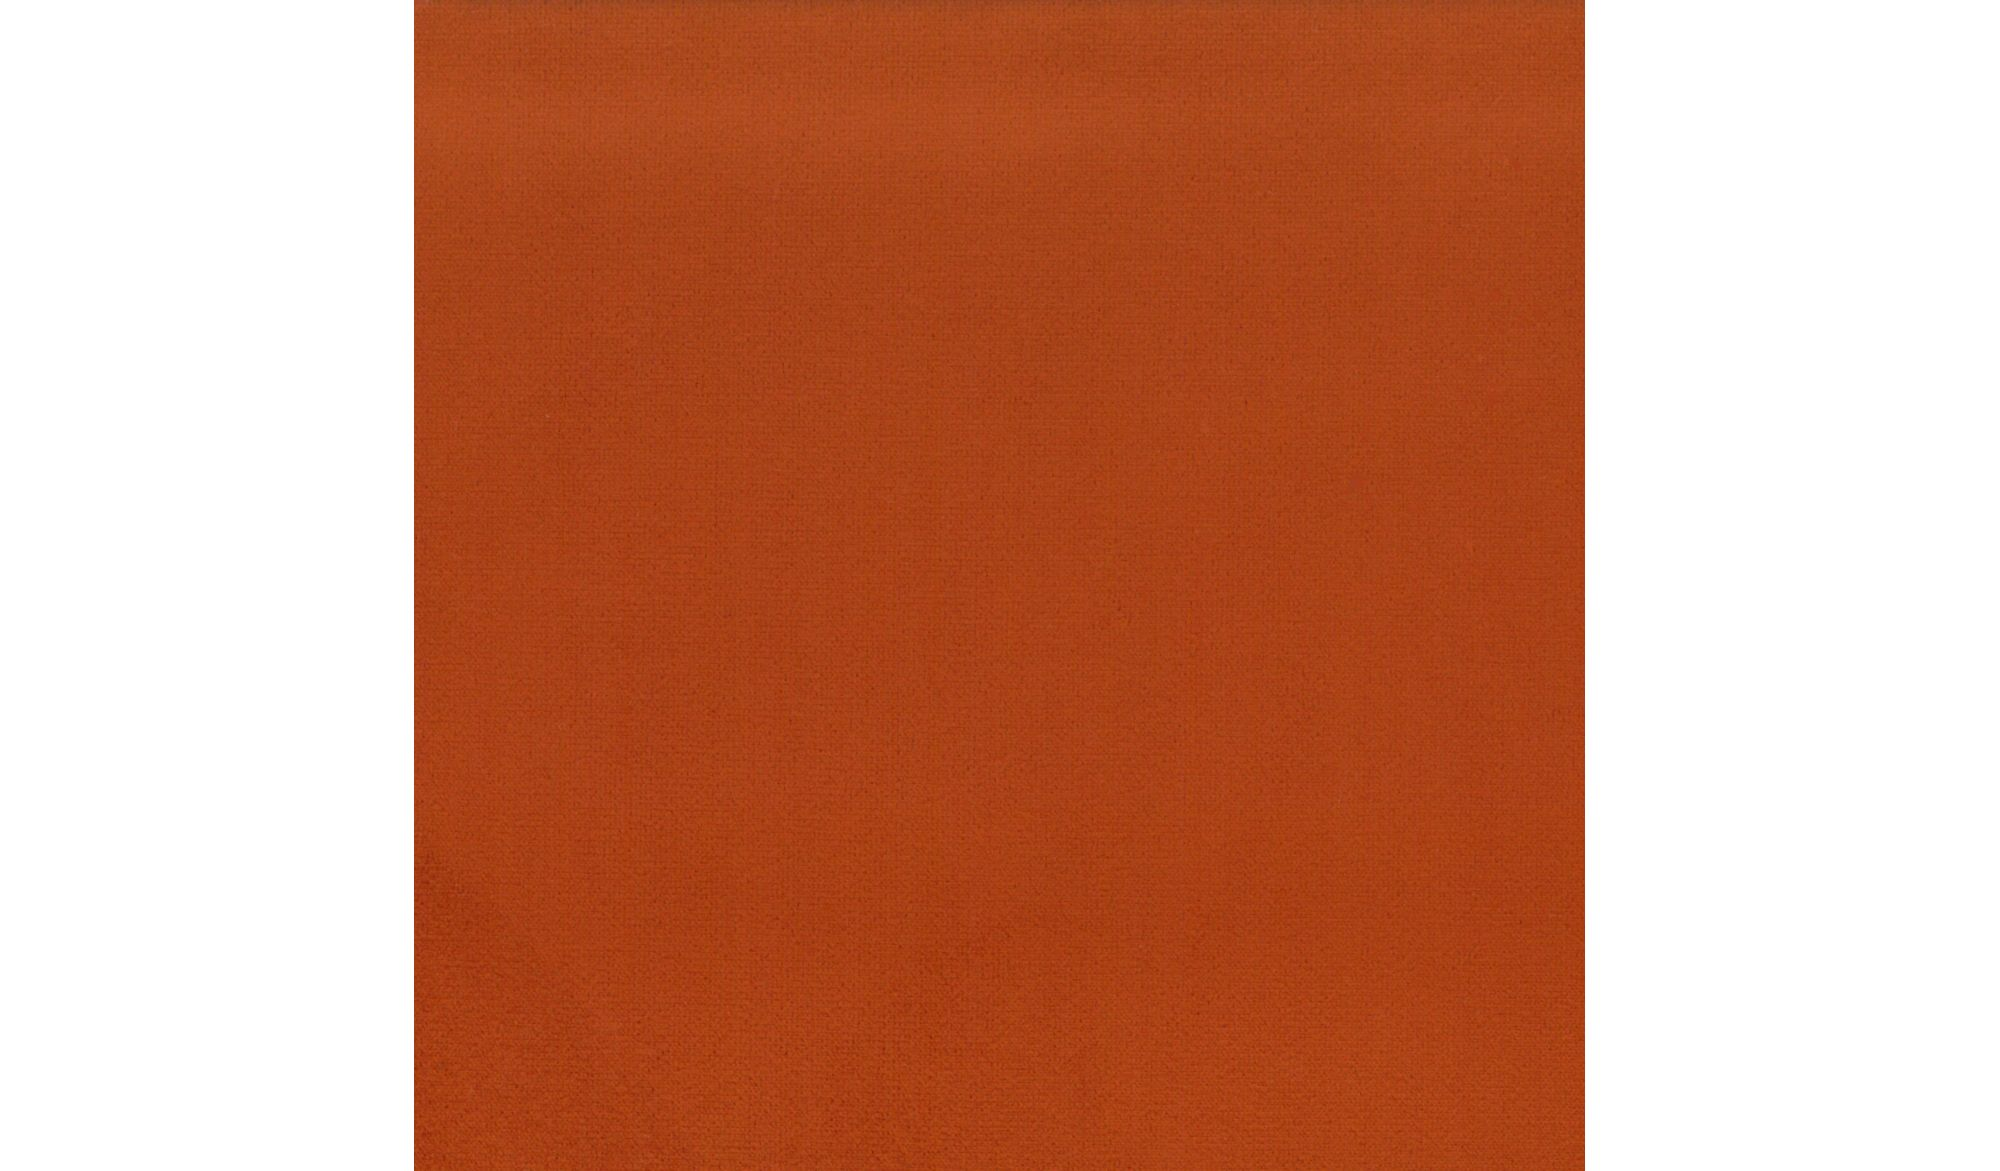 SCOT Saffron-22